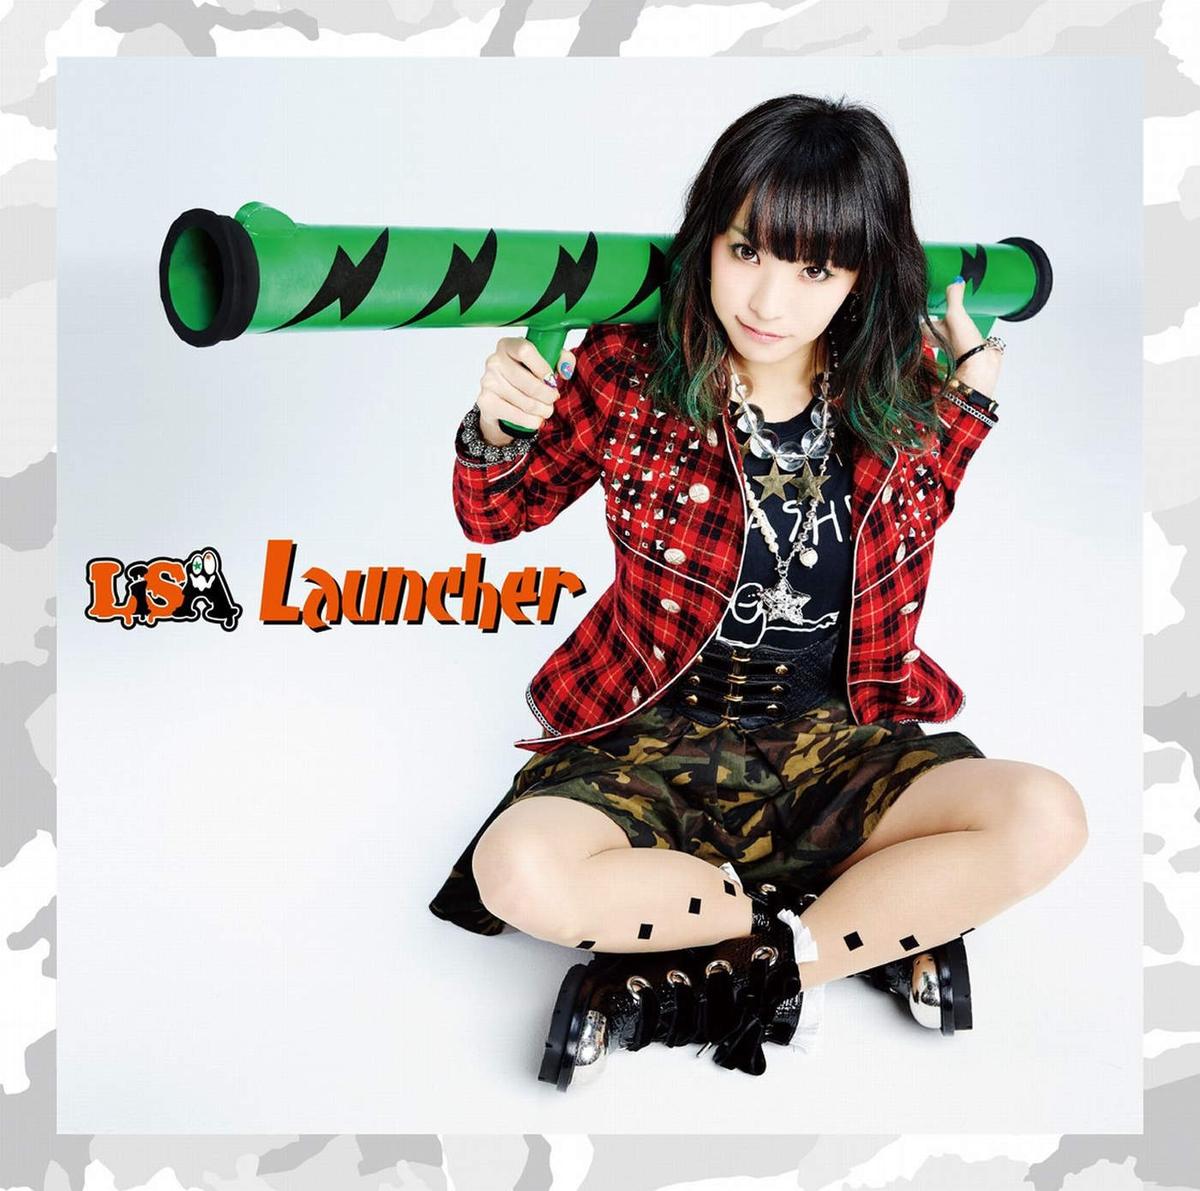 #nowplaying LiSA - rapid life シンドローム / Launcher これ好きだわー http://t.co/HcLsUiXtuq